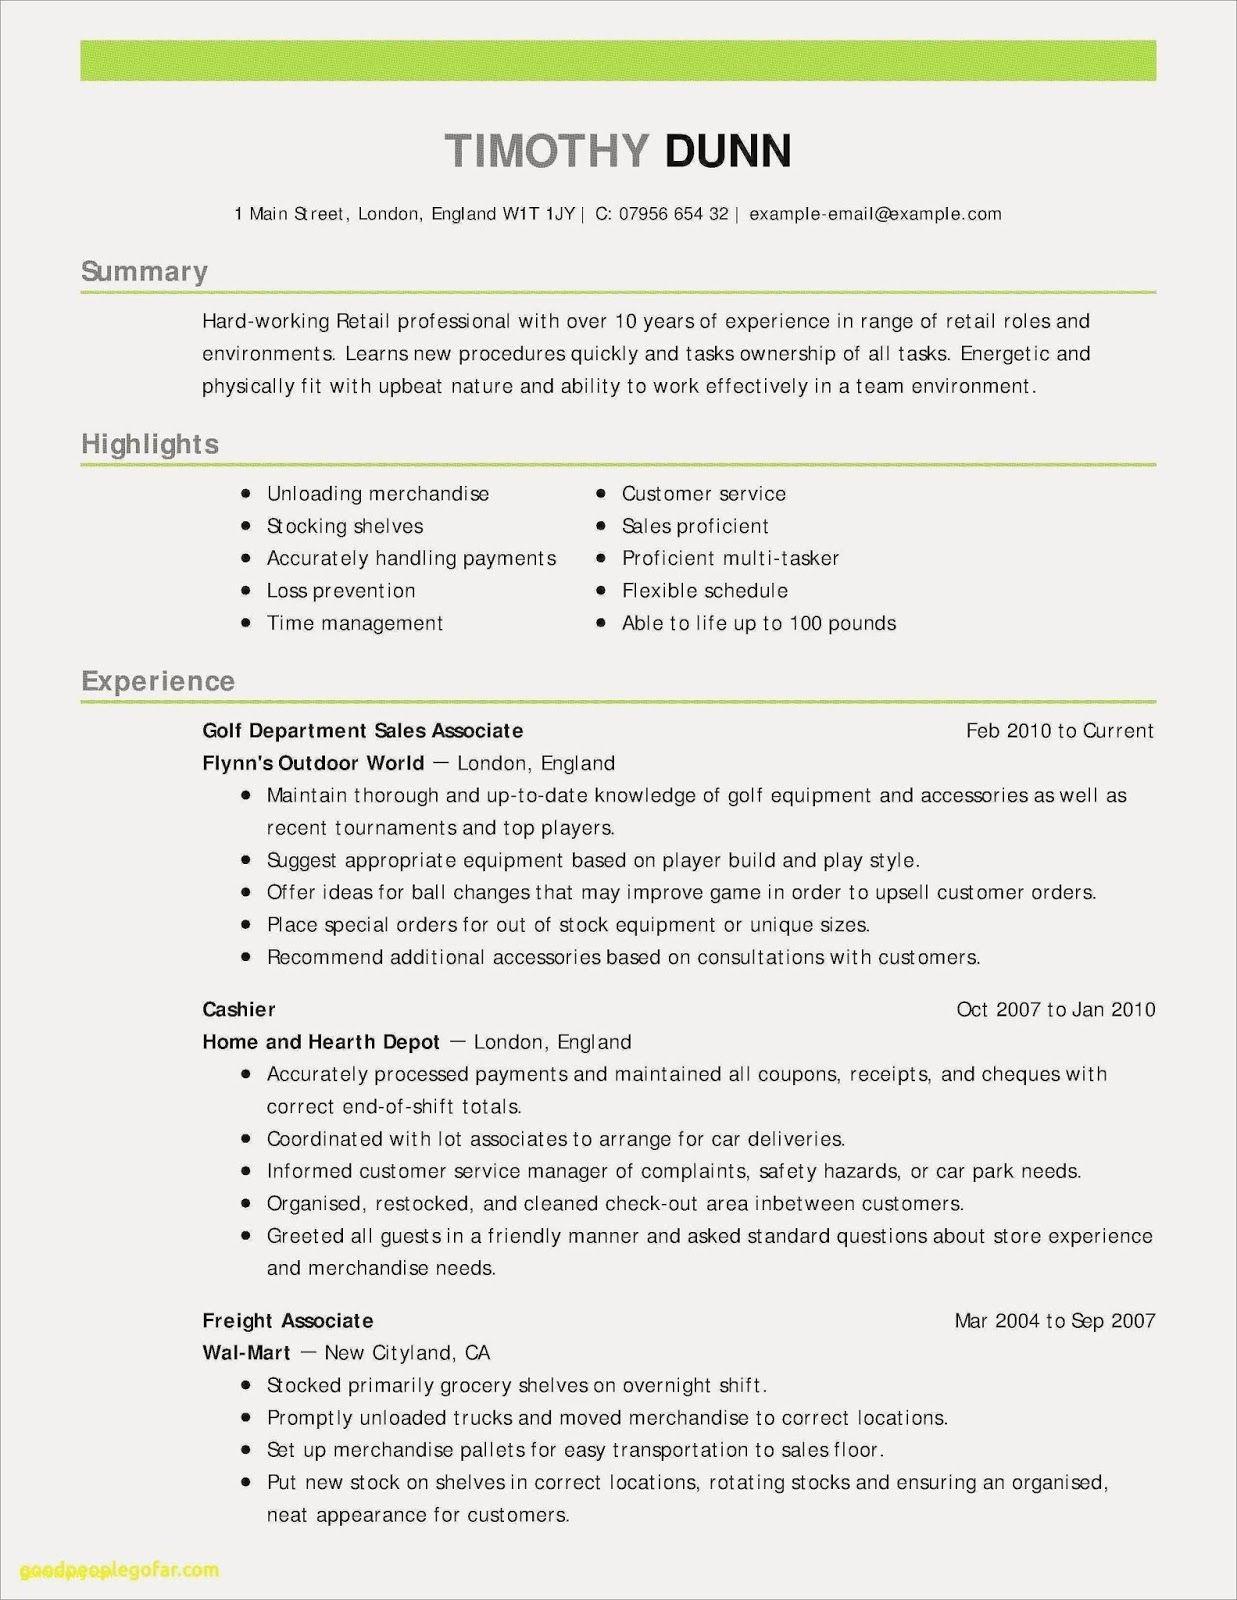 Secretary Resume Examples Secretary Resume Examples 2019 Secretary Resume Examples 2020 Secretar Resume Objective Examples Good Resume Examples Basic Resume